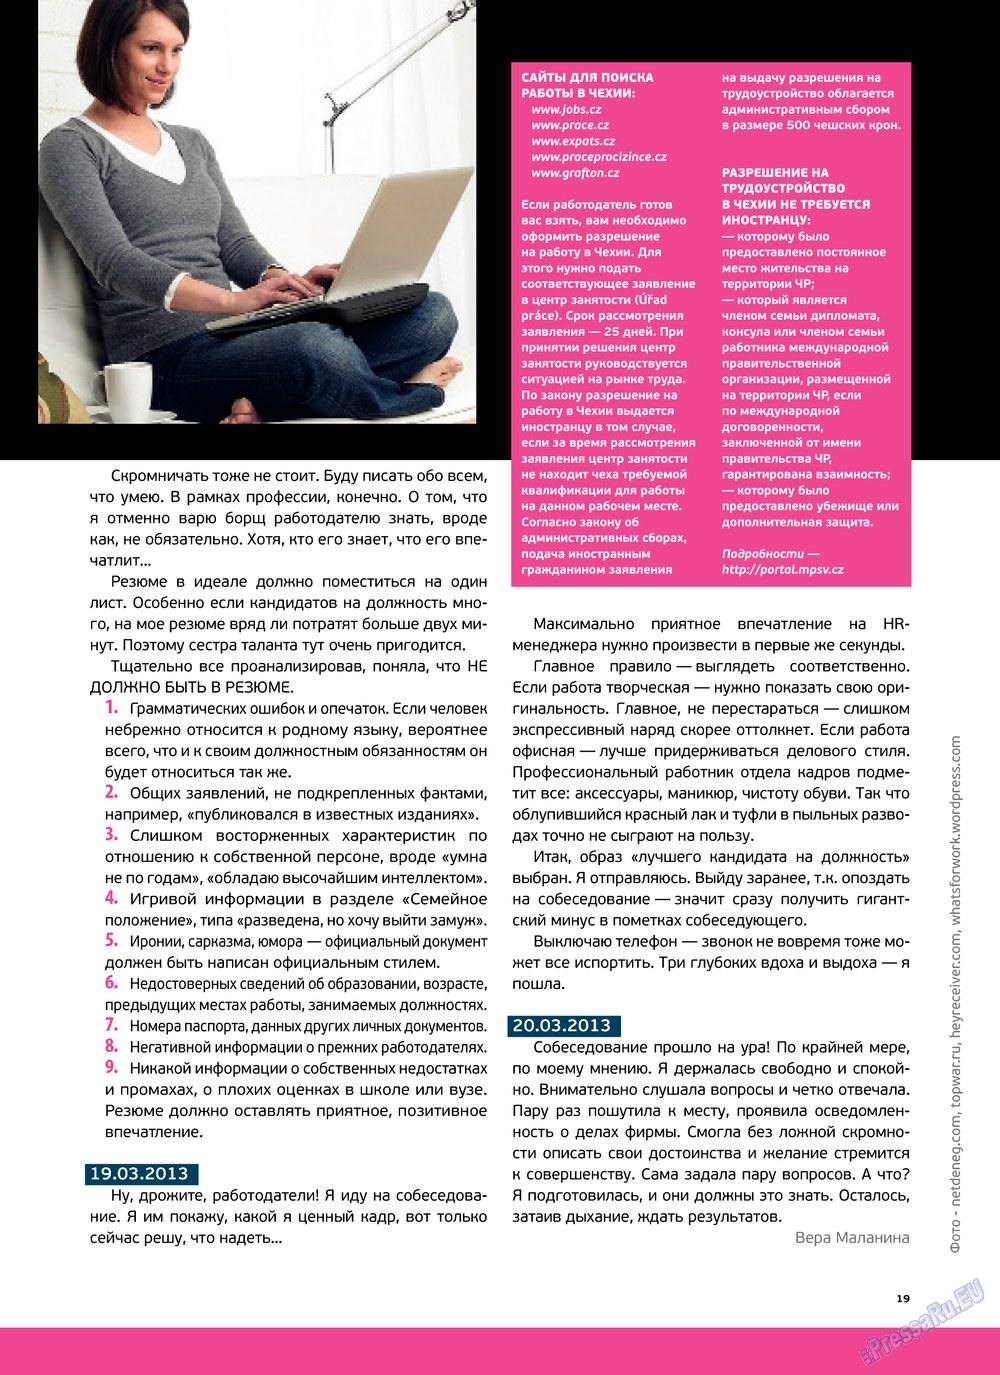 Артек (журнал). 2013 год, номер 1, стр. 21